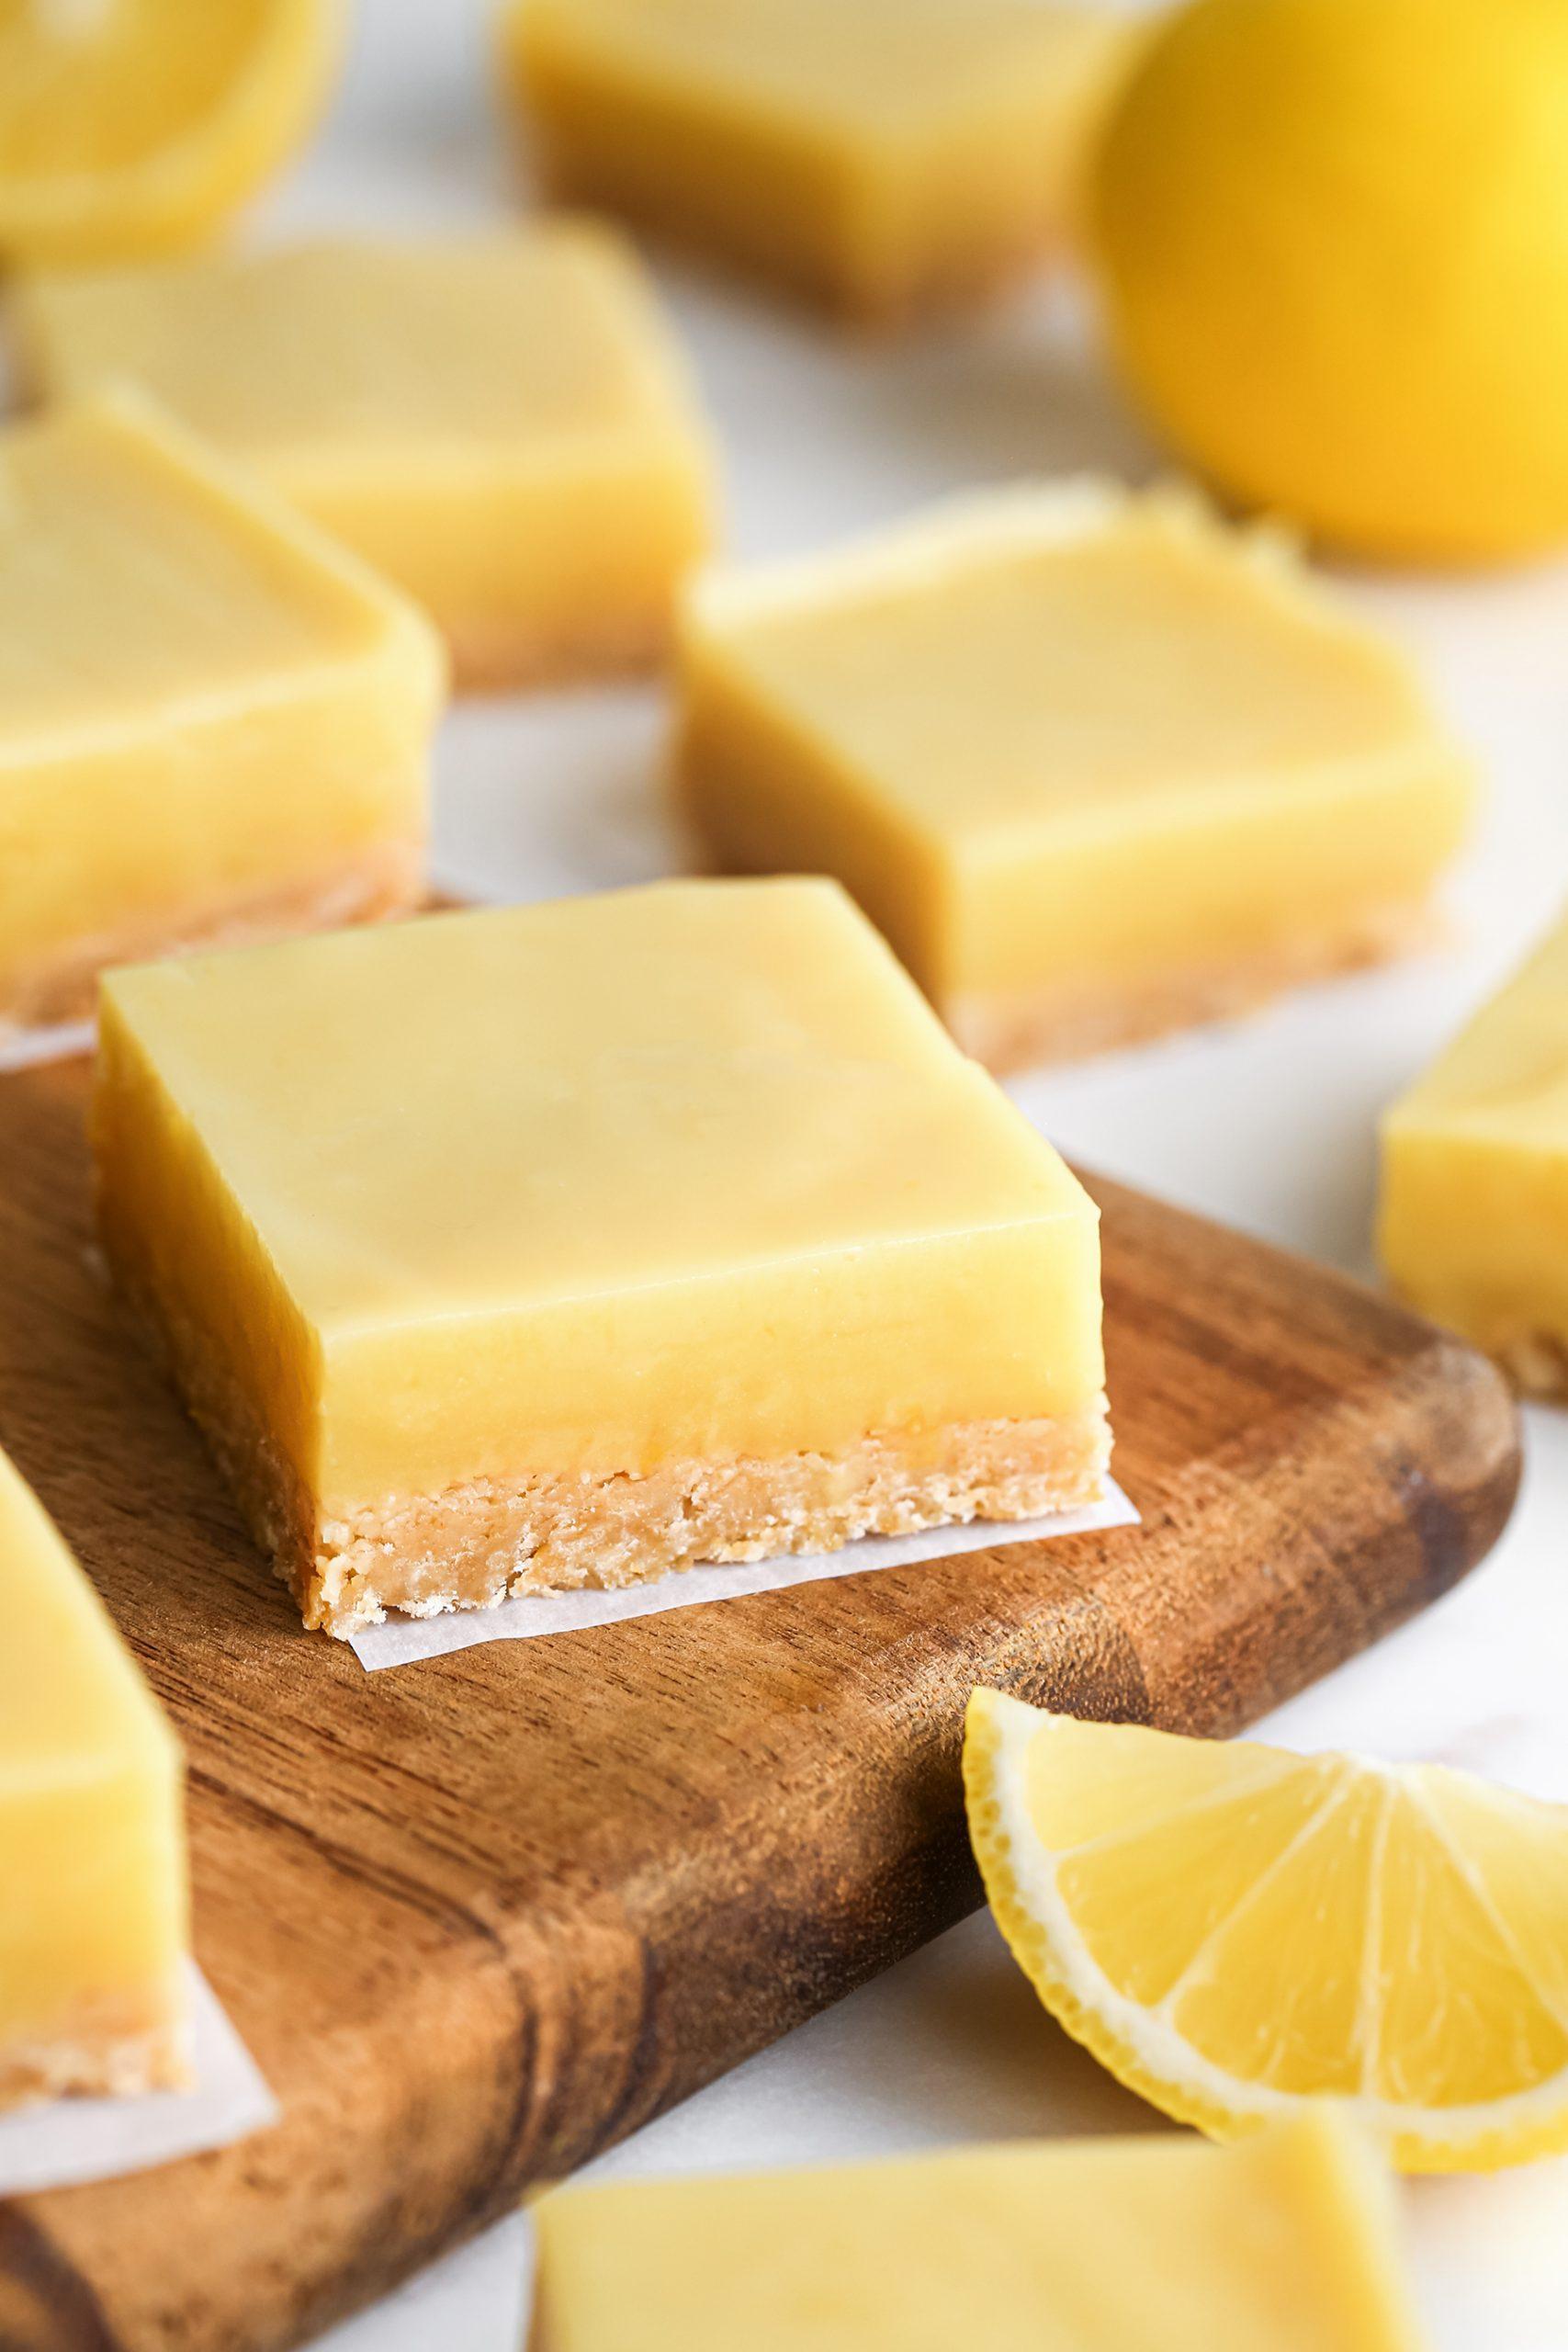 Naturally Sweetened Lemon Bars